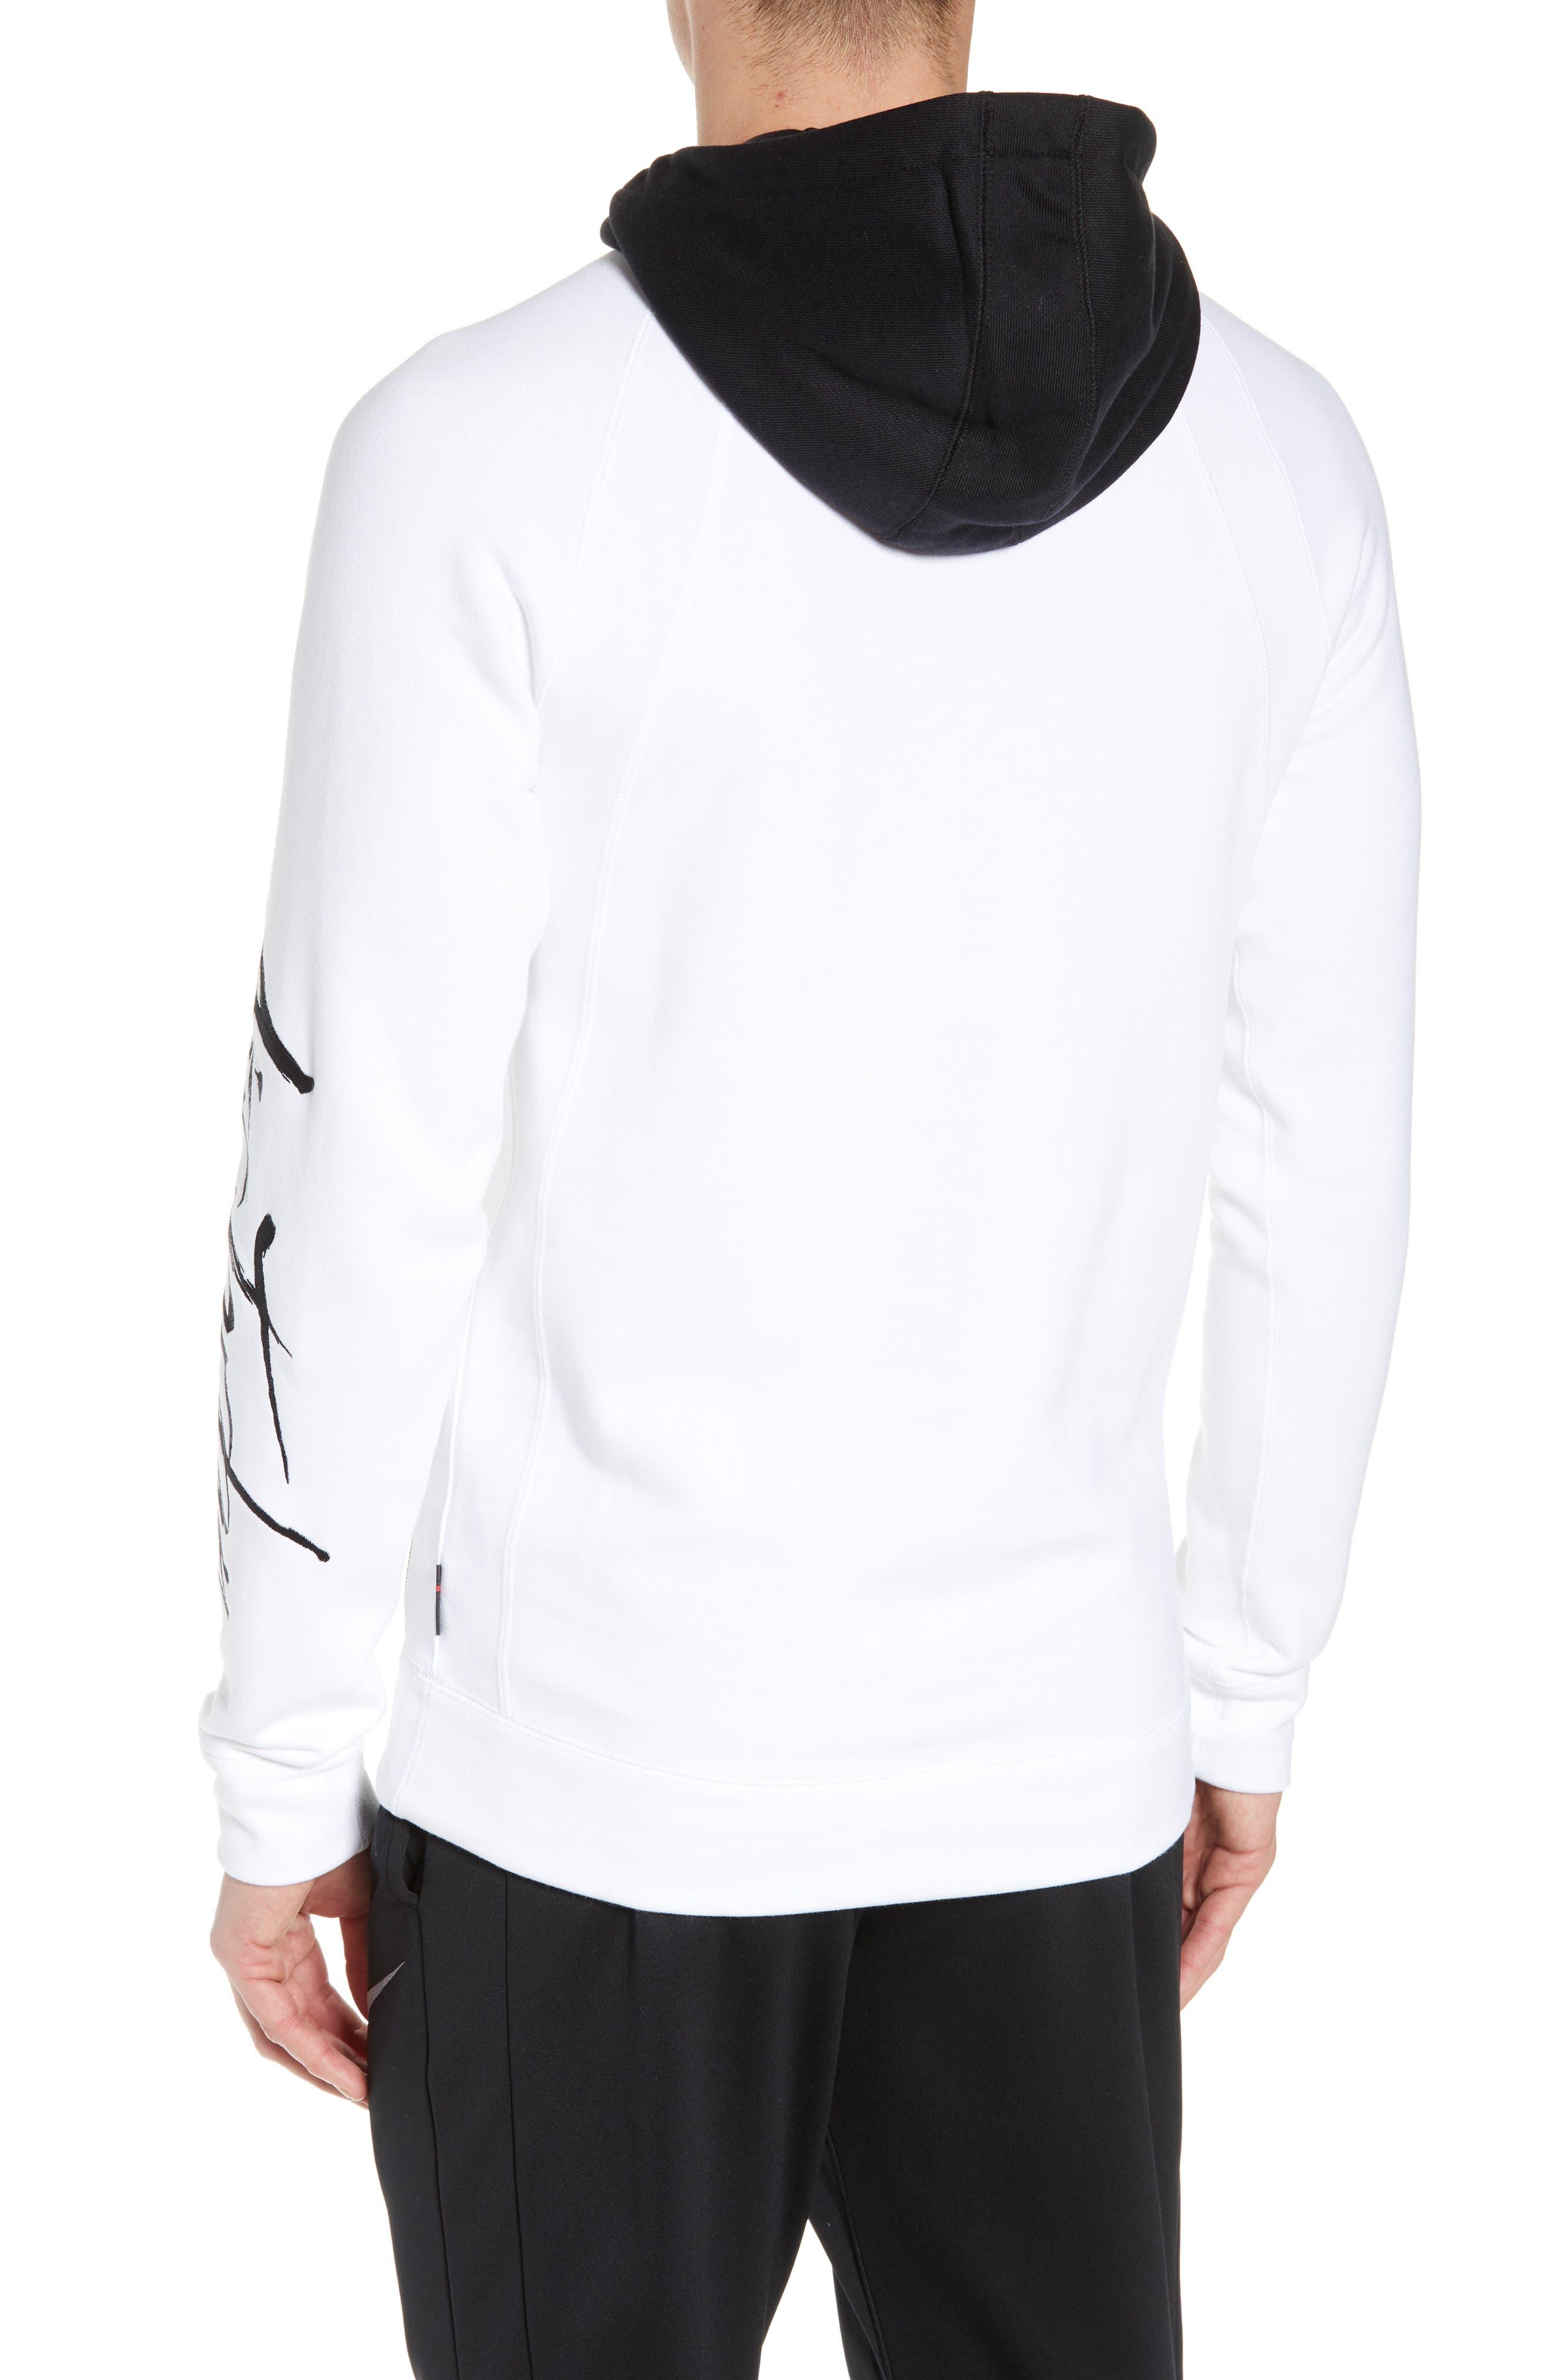 JORDAN, Sportswear Greatest Fleece Pullover Hoodie, Alternate thumbnail 2, color, WHITE/ BLACK